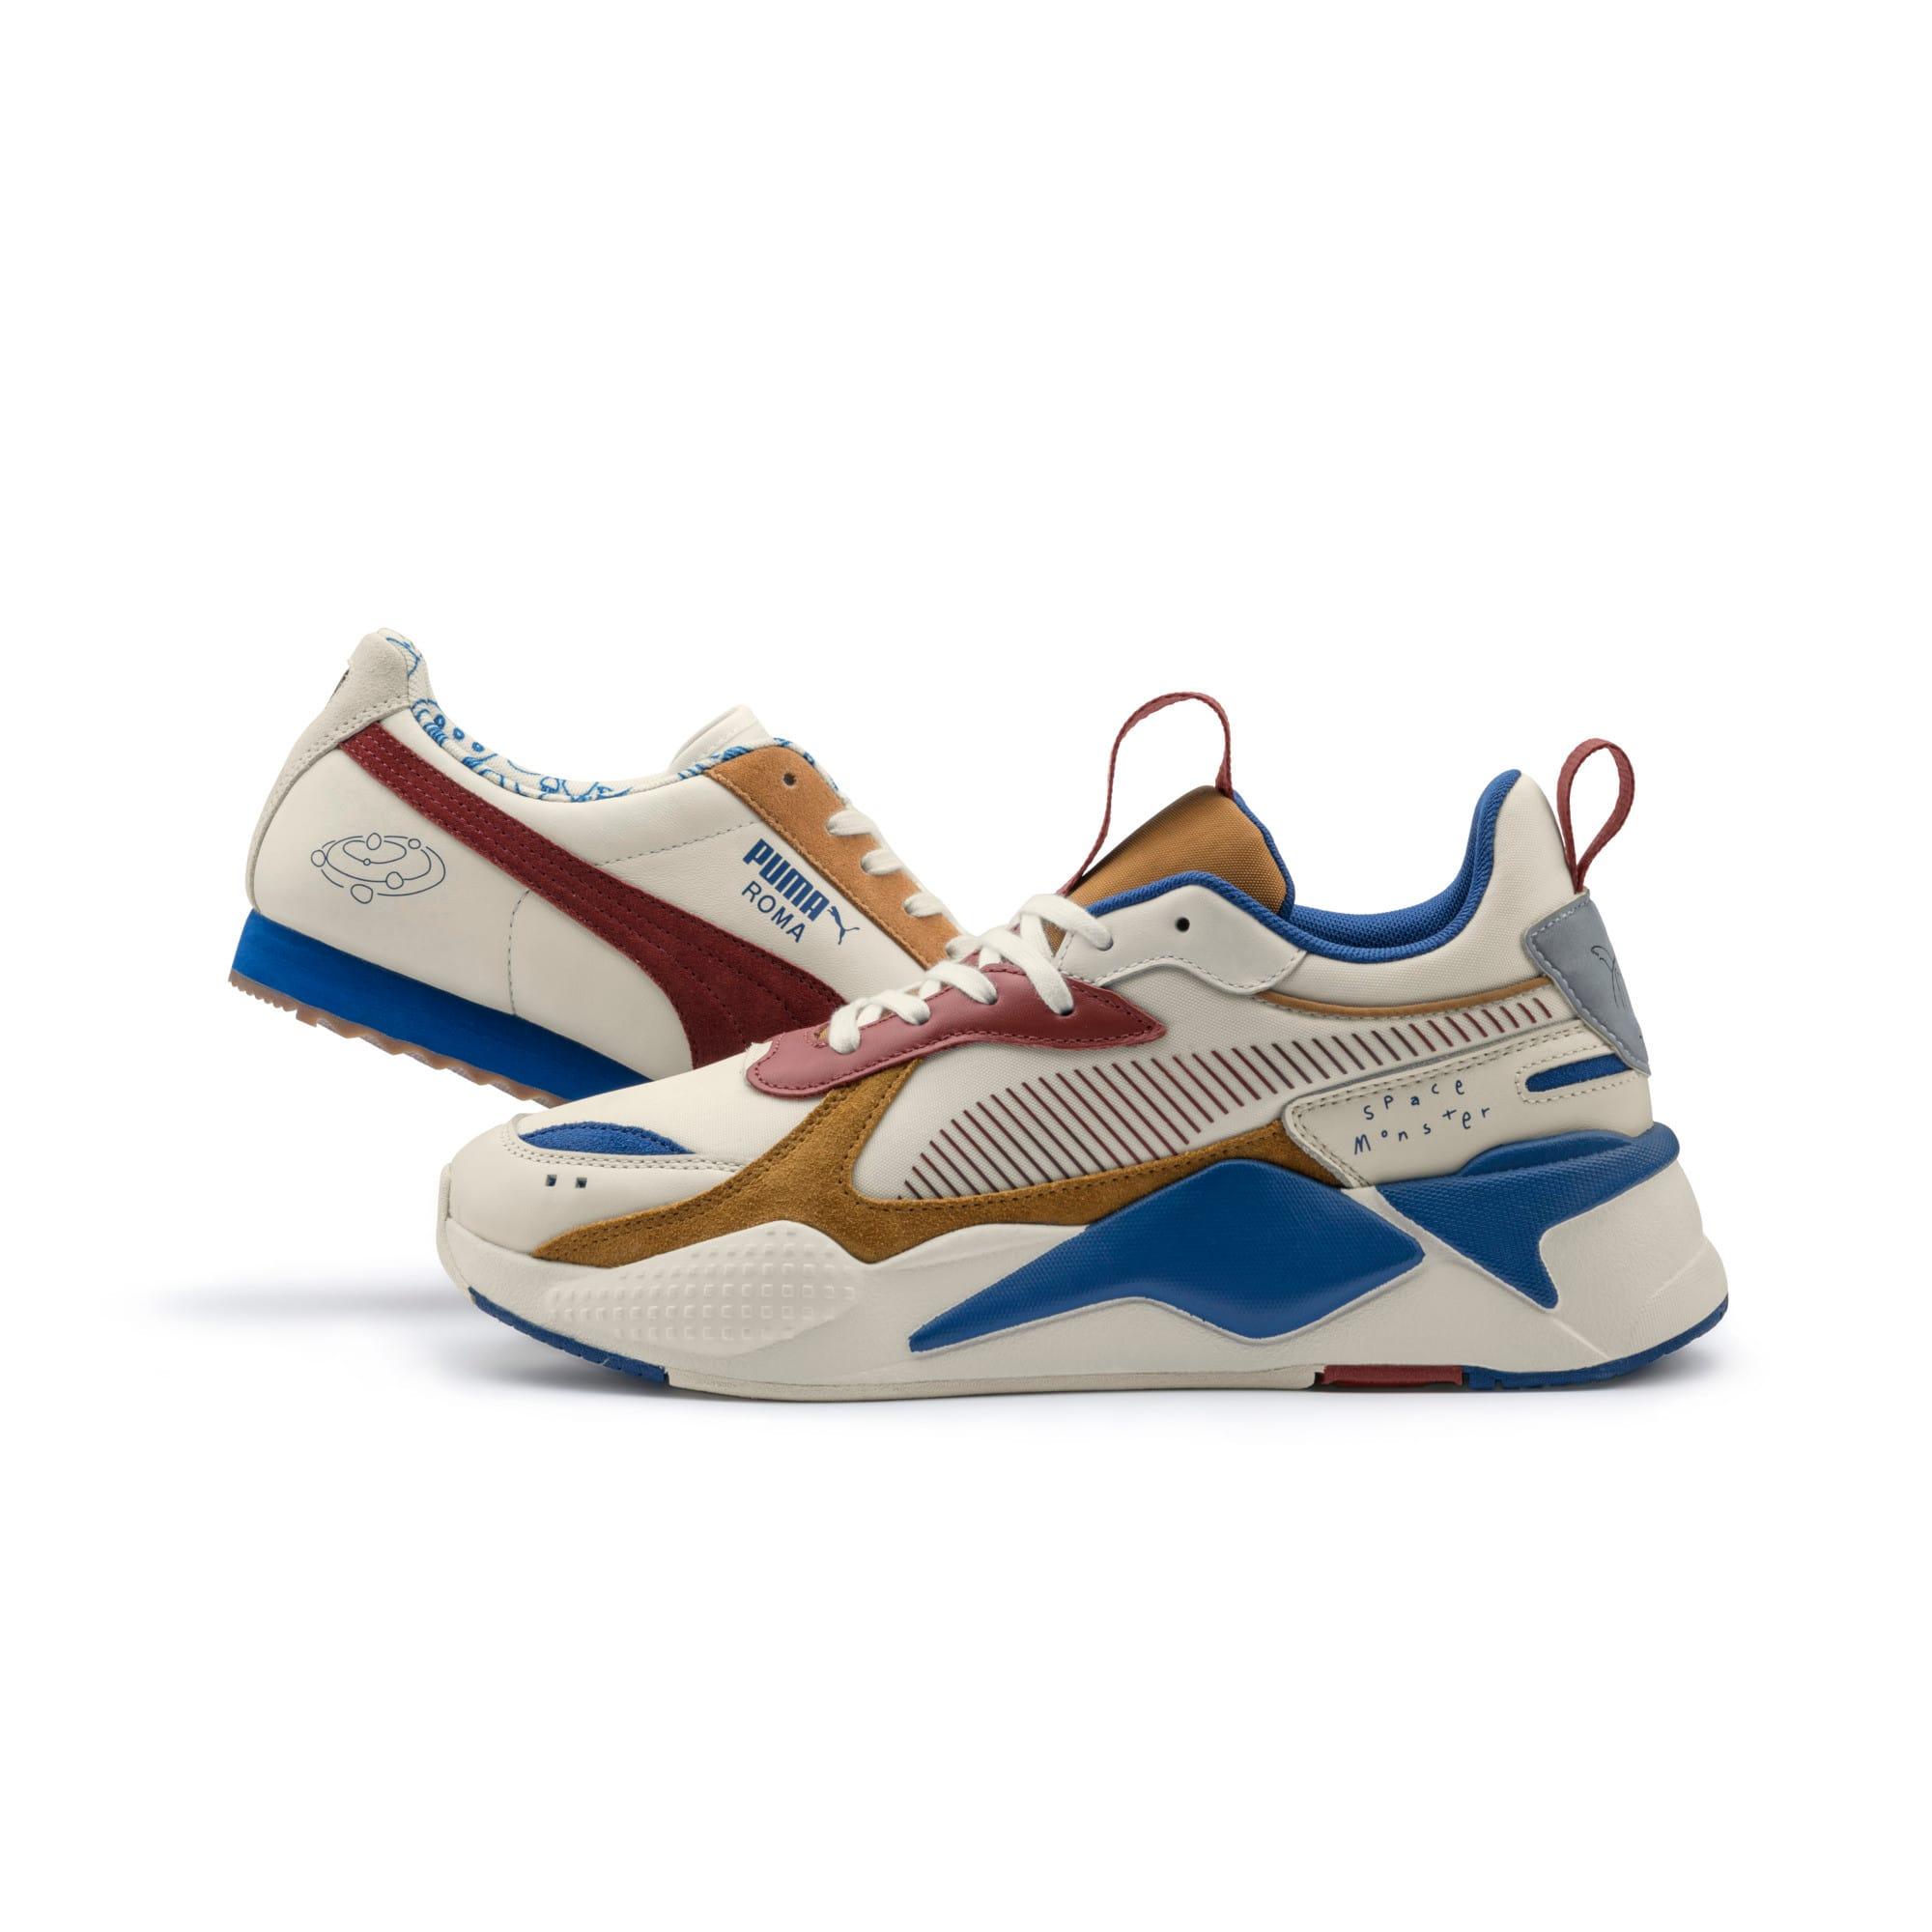 Thumbnail 9 of PUMA x TYAKASHA RS-X Sneakers, Whisper White-Fired Brick, medium